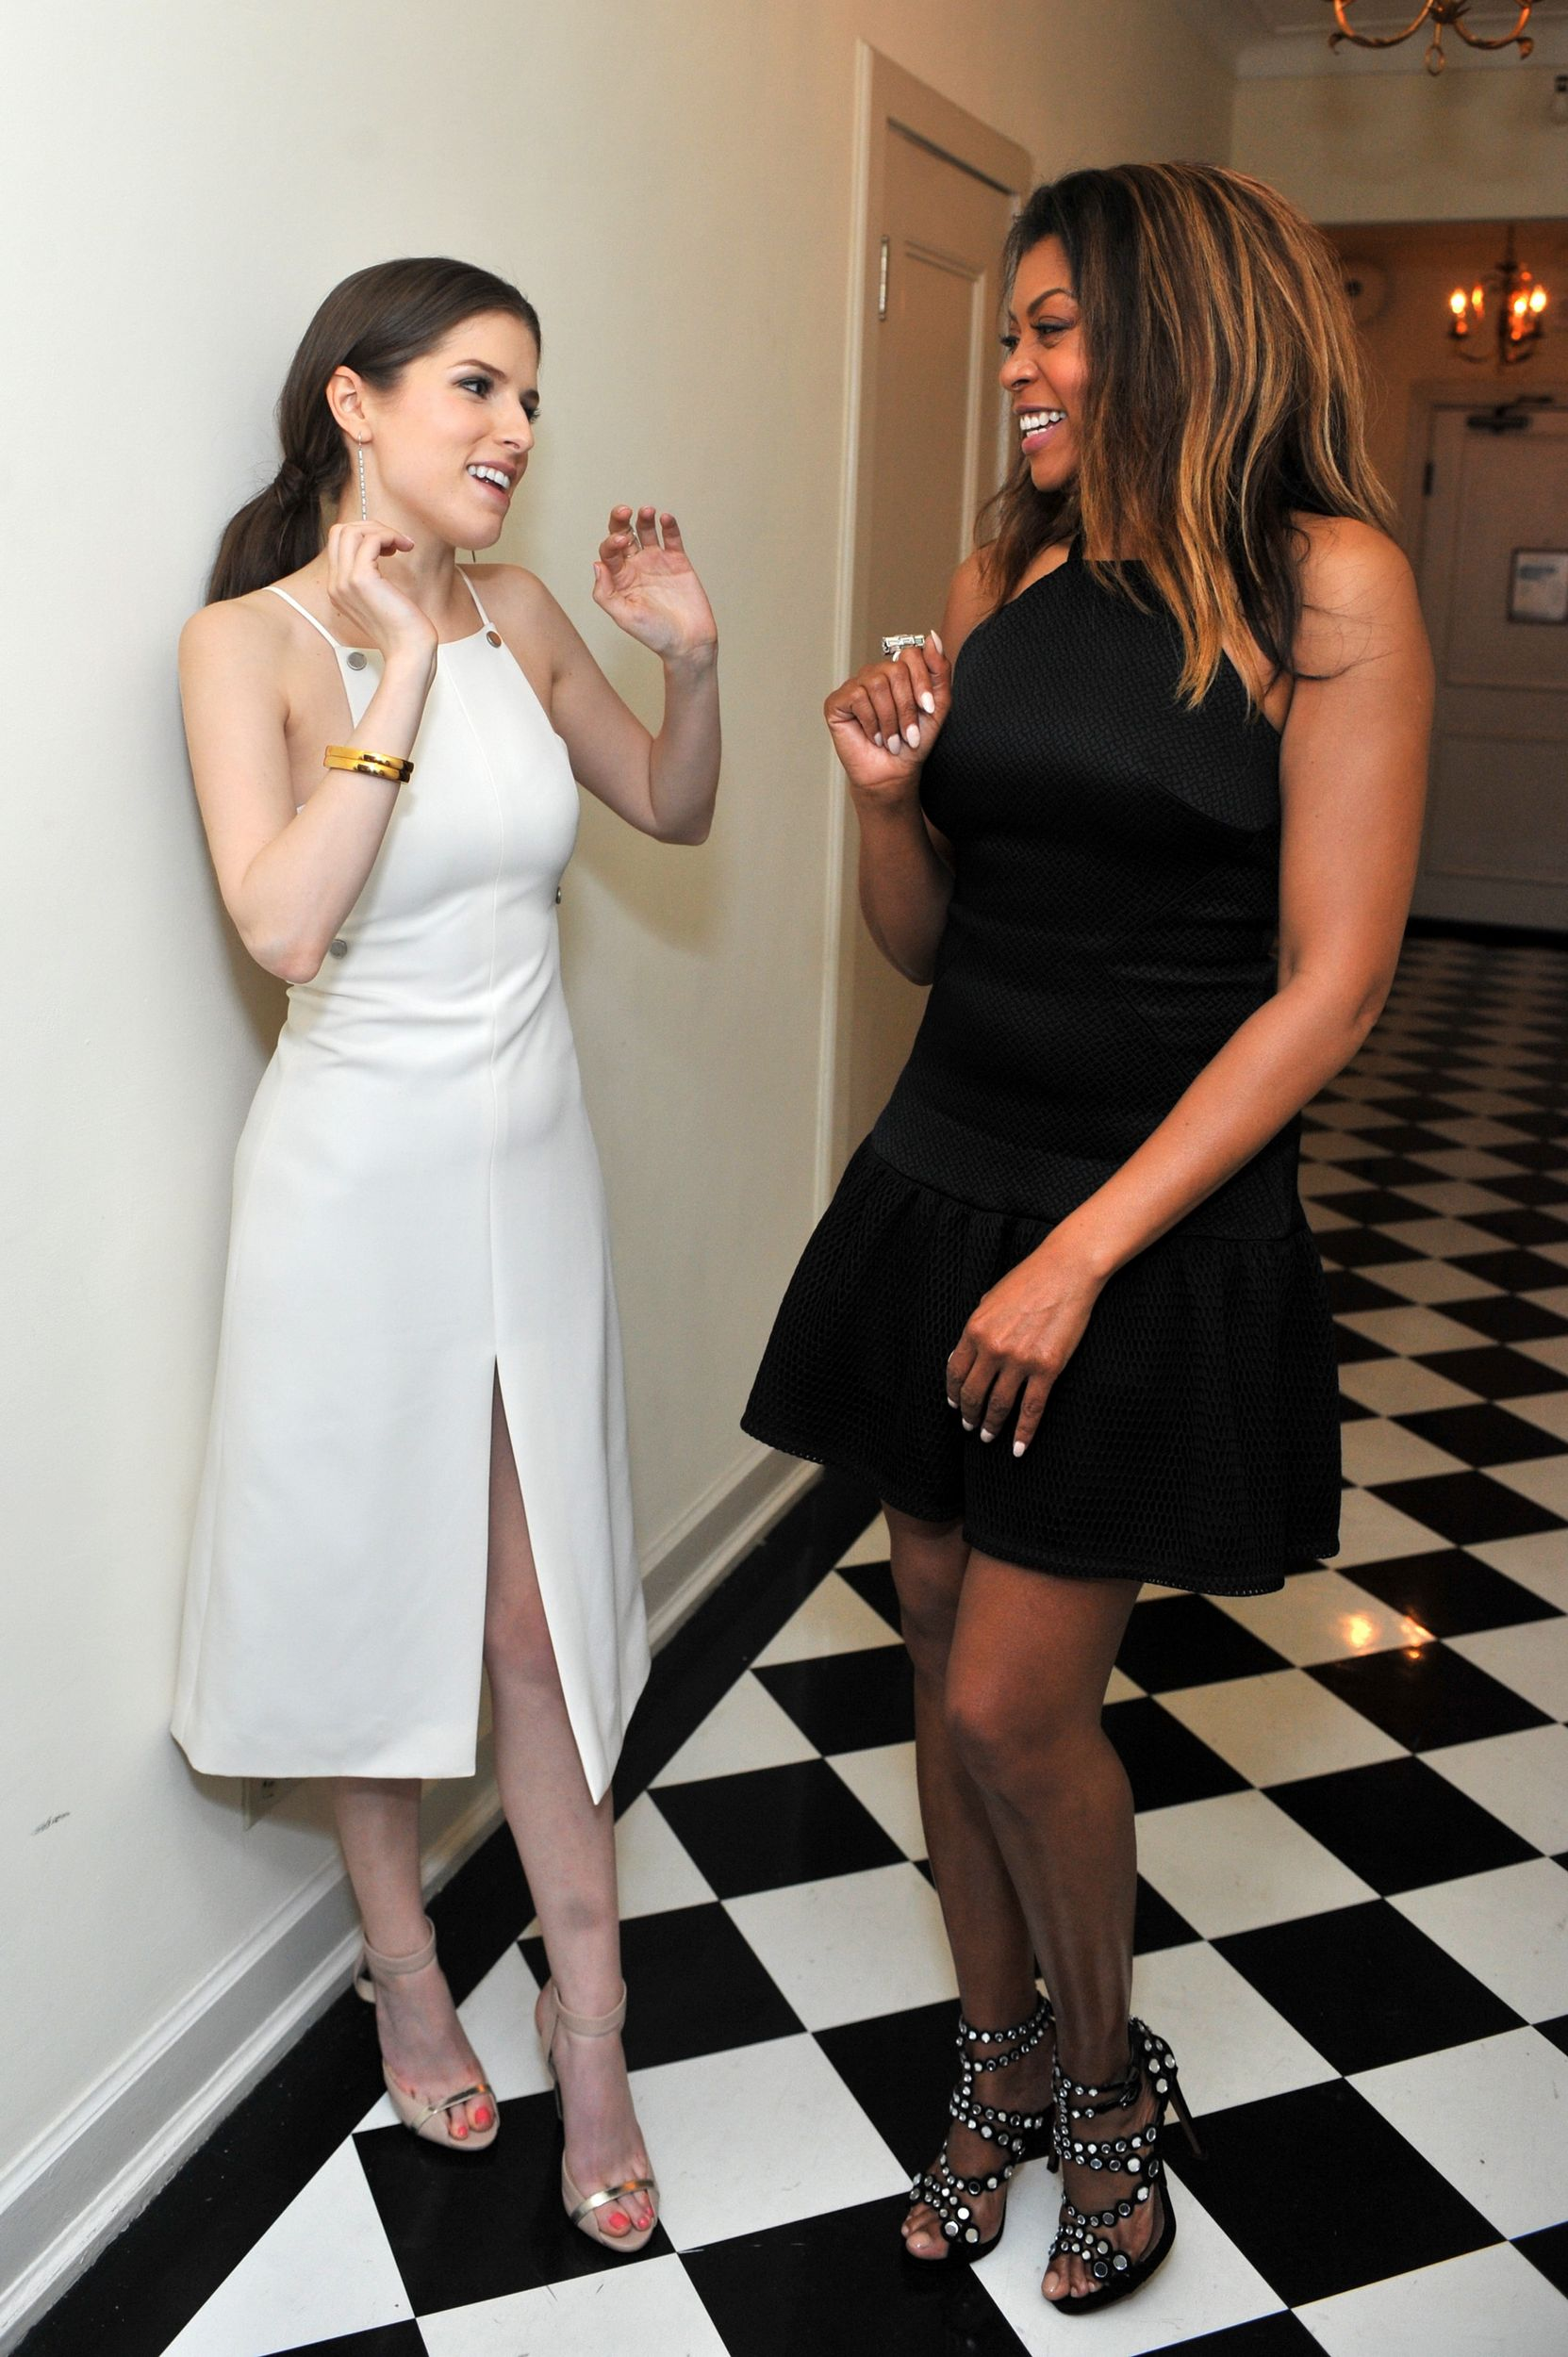 Anna Kendrick - 05292015 (14).jpg